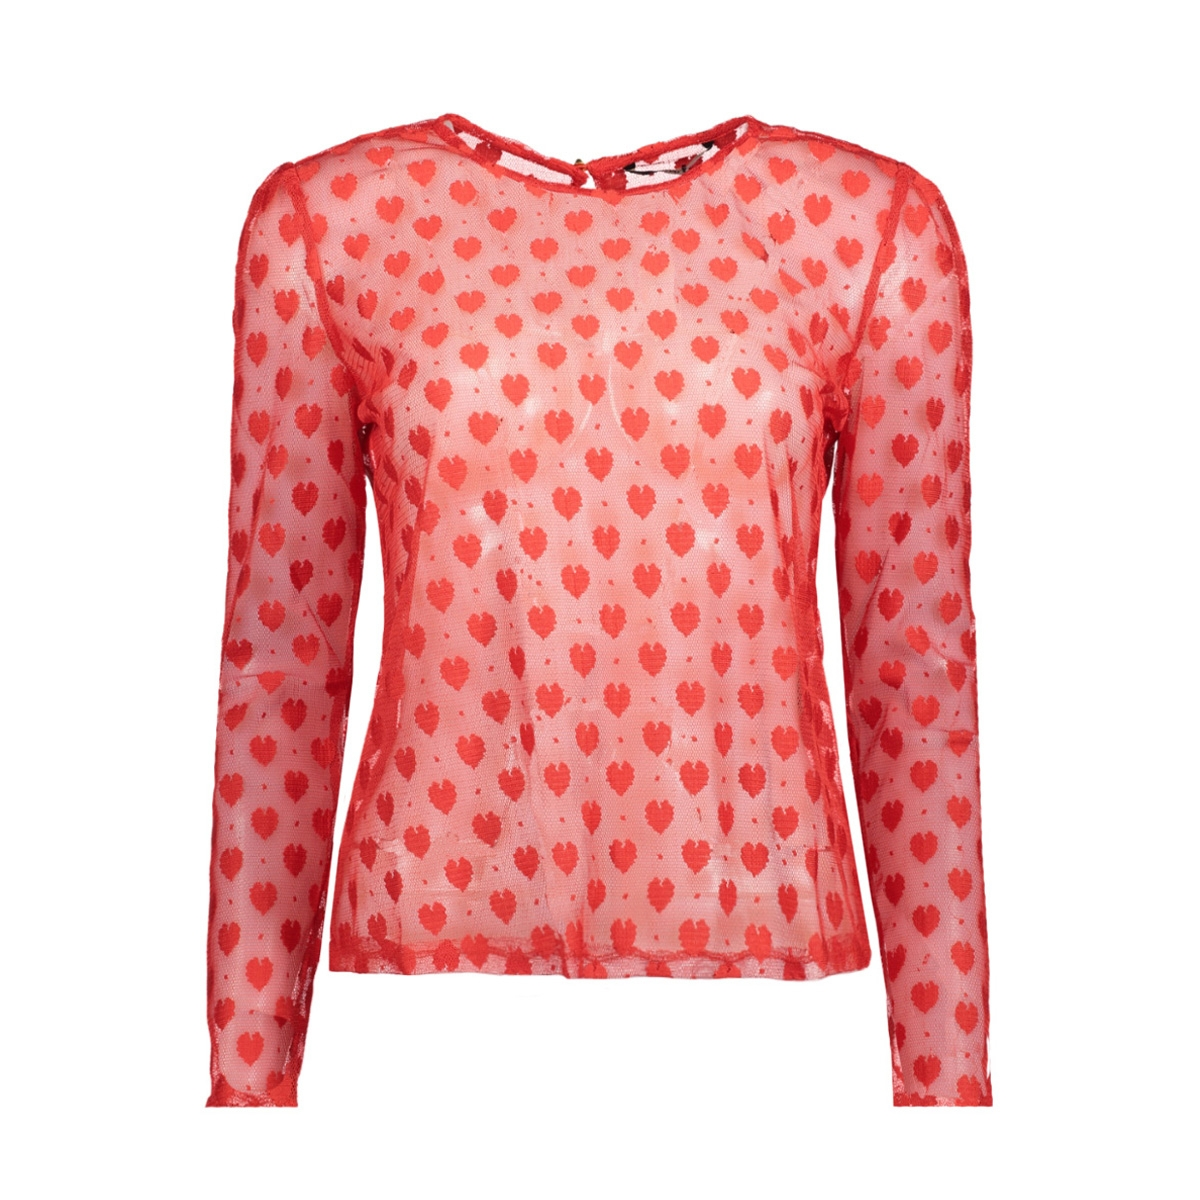 onlfaith l/s heart top wvn 15143615 only t-shirt flame scarlet/heart